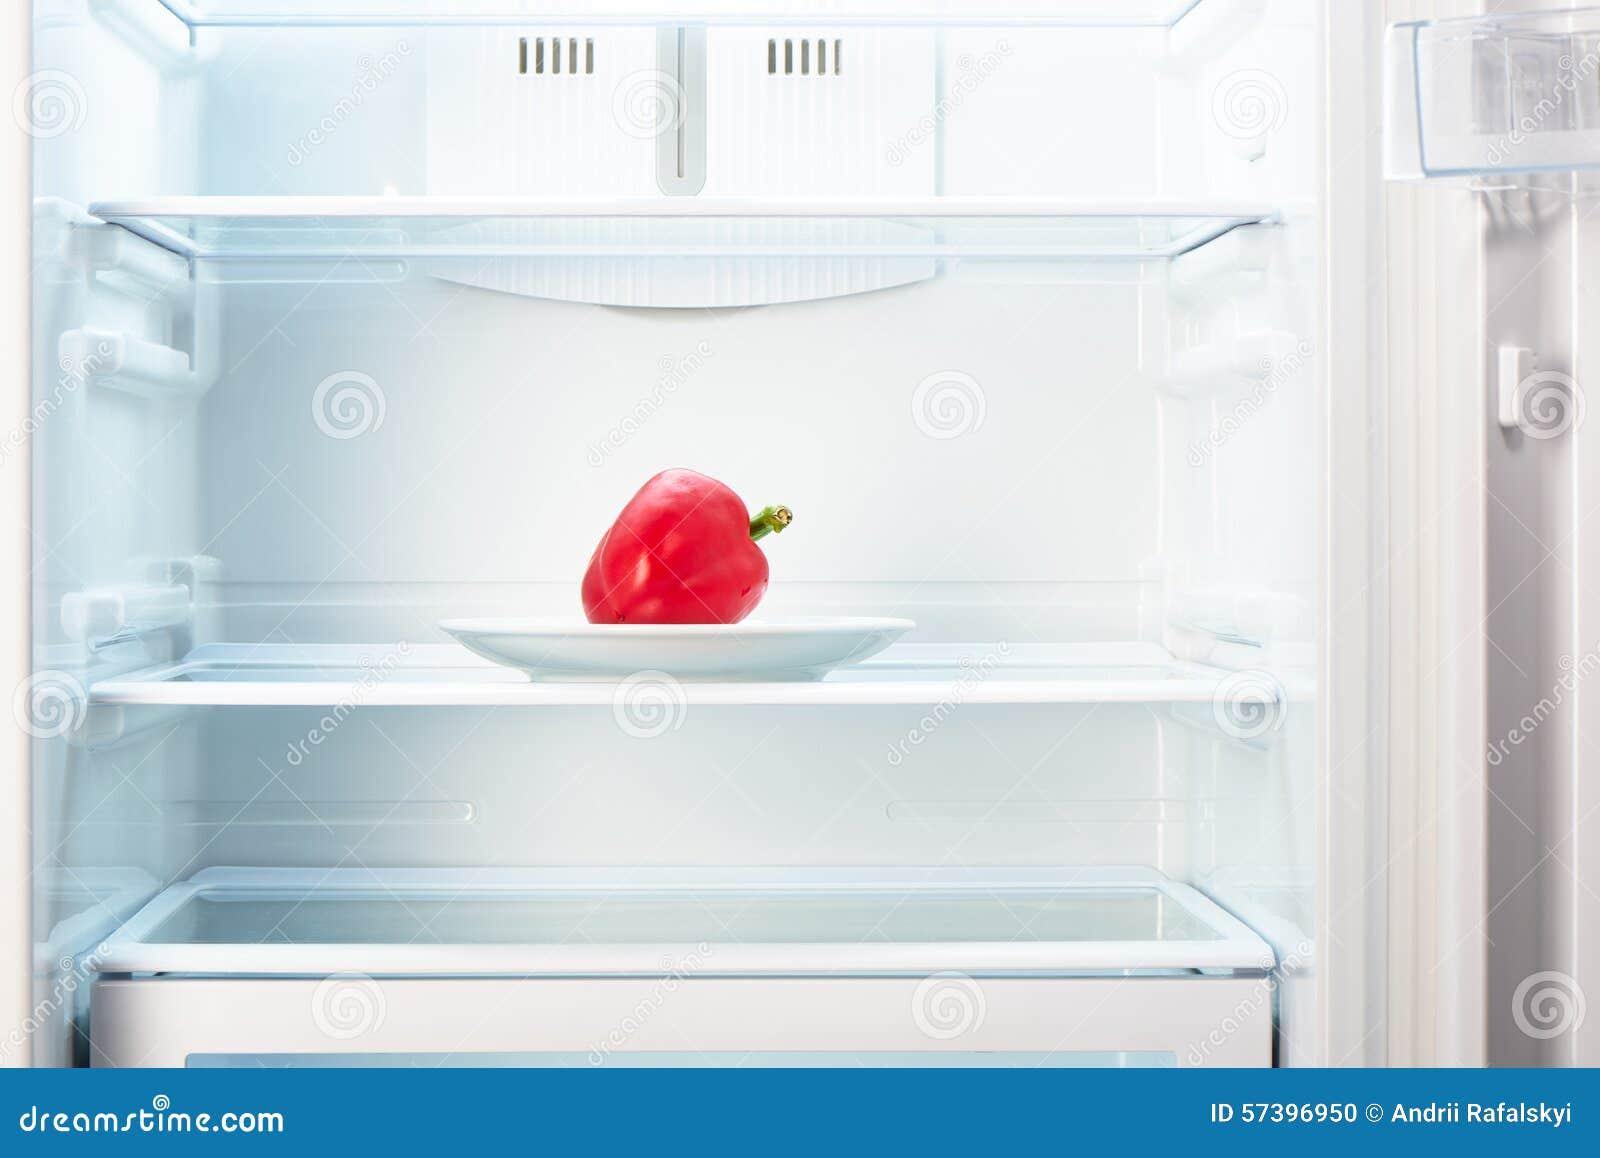 Spaanse peper op witte plaat in open lege ijskast